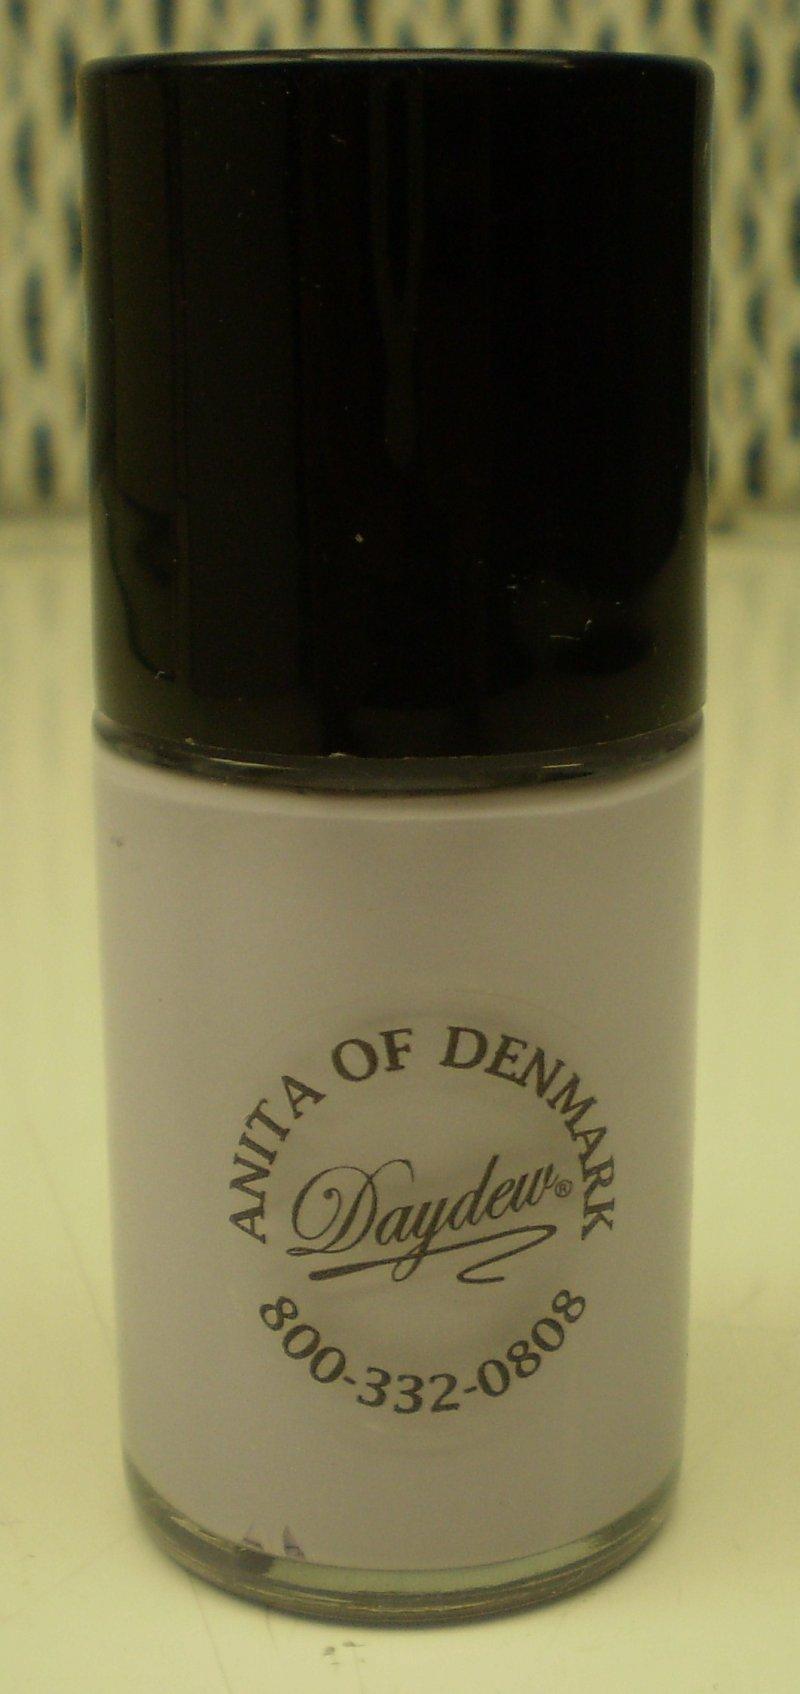 Image 0 of Daydew Illusion Toners Lavender